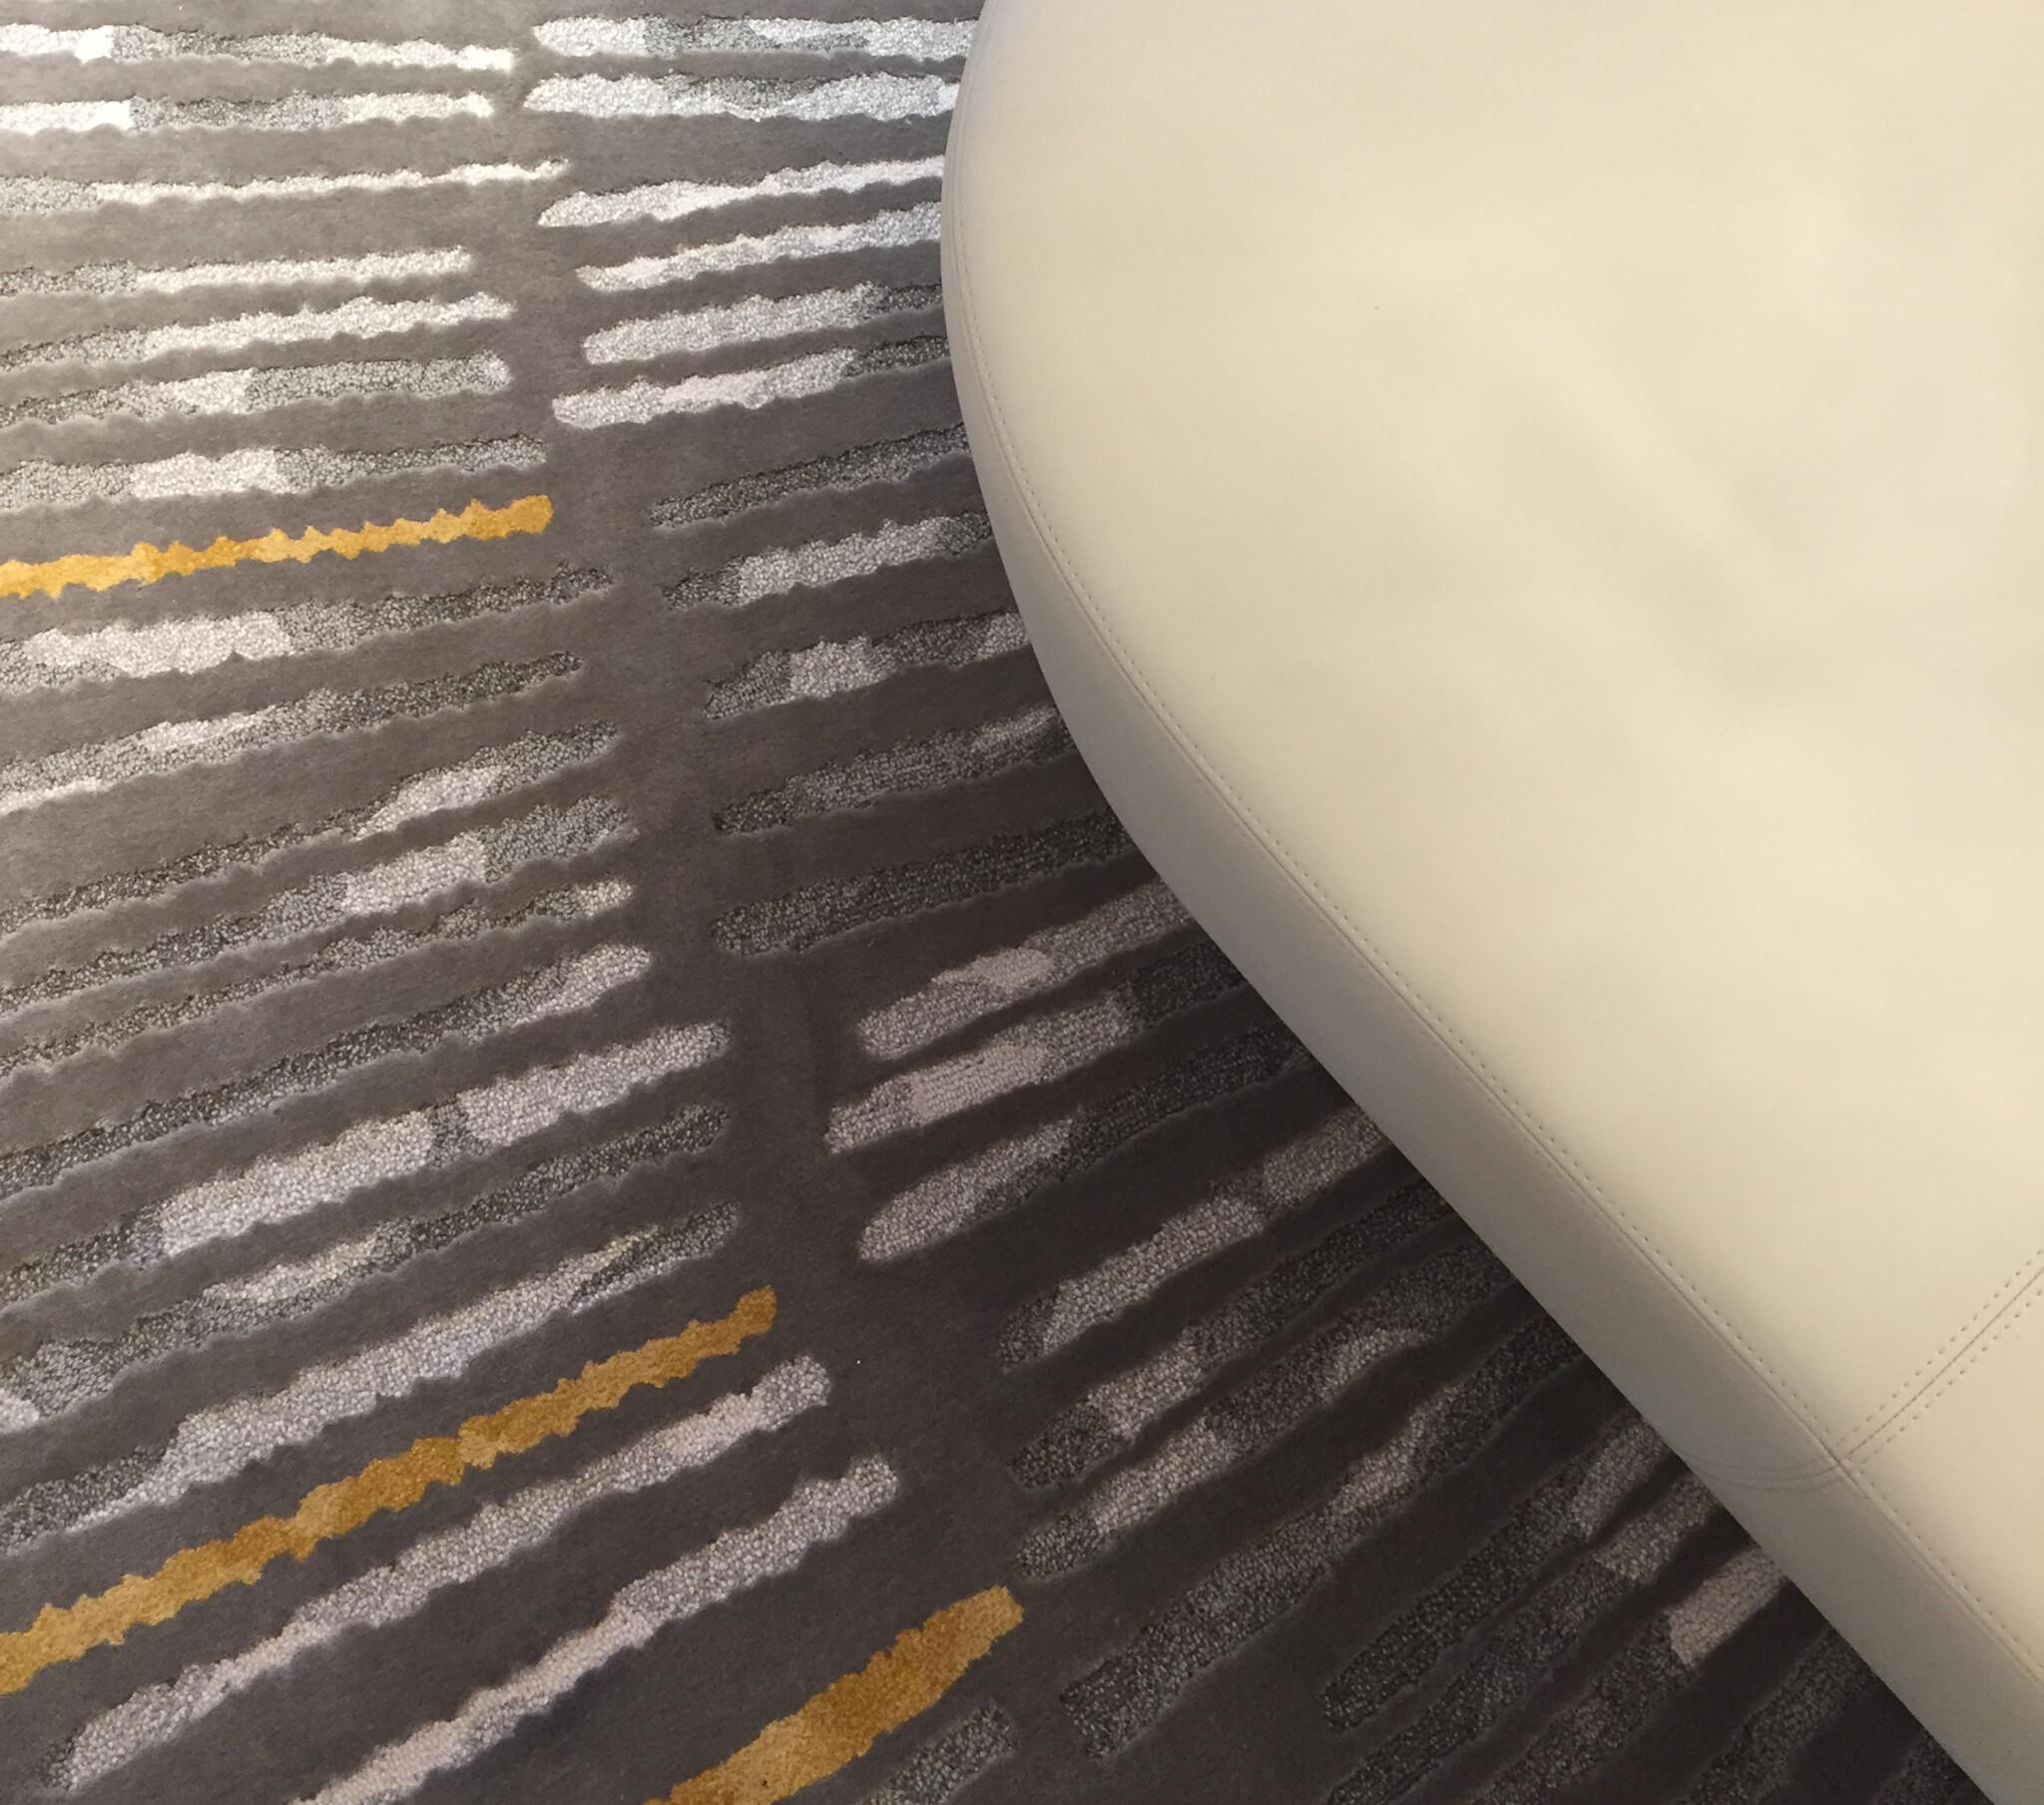 LE BOUGAINVILLE_PONANT_By Loomah Bespoke Carpets & Rugs_Inteior Design Studio Jean Philippe Nuel (4)